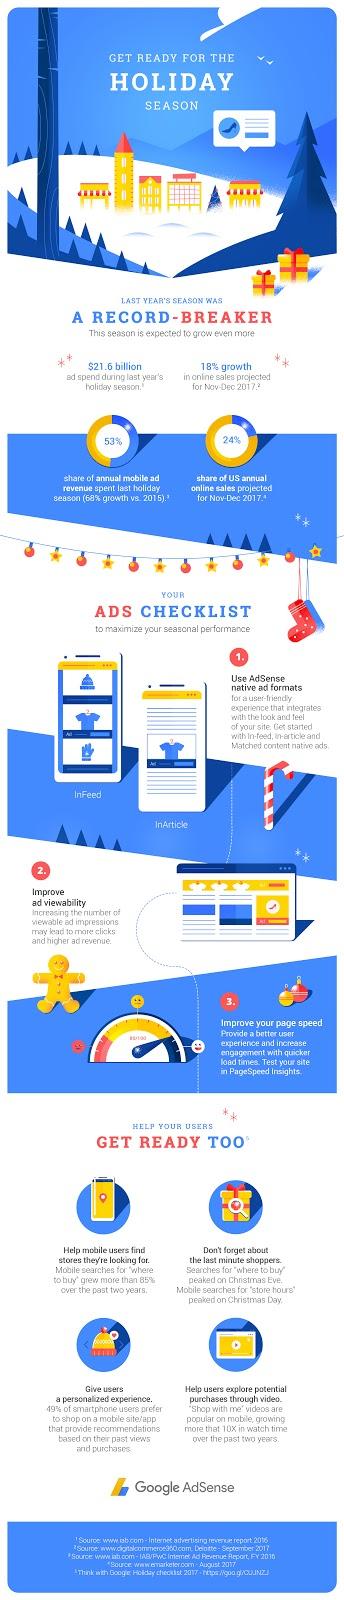 Google AdSense 2017 Holidays Tips Infographic